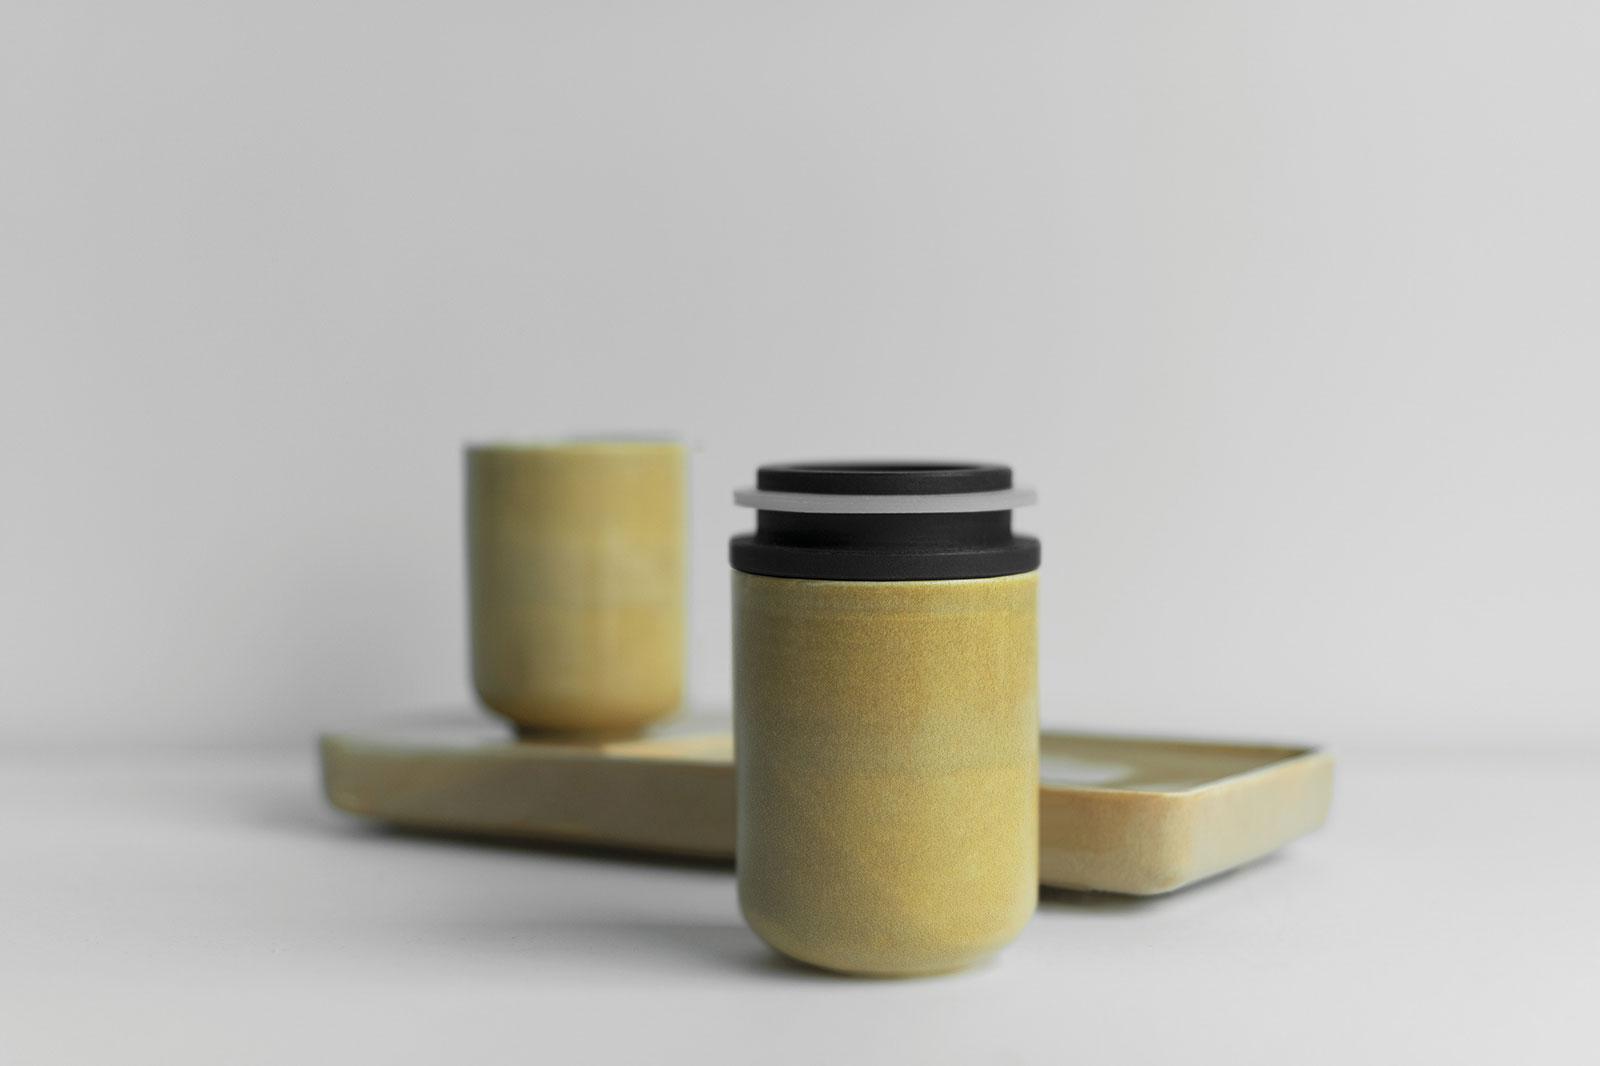 001_CoffeeMaker_Kovács-Kristóf.jpg